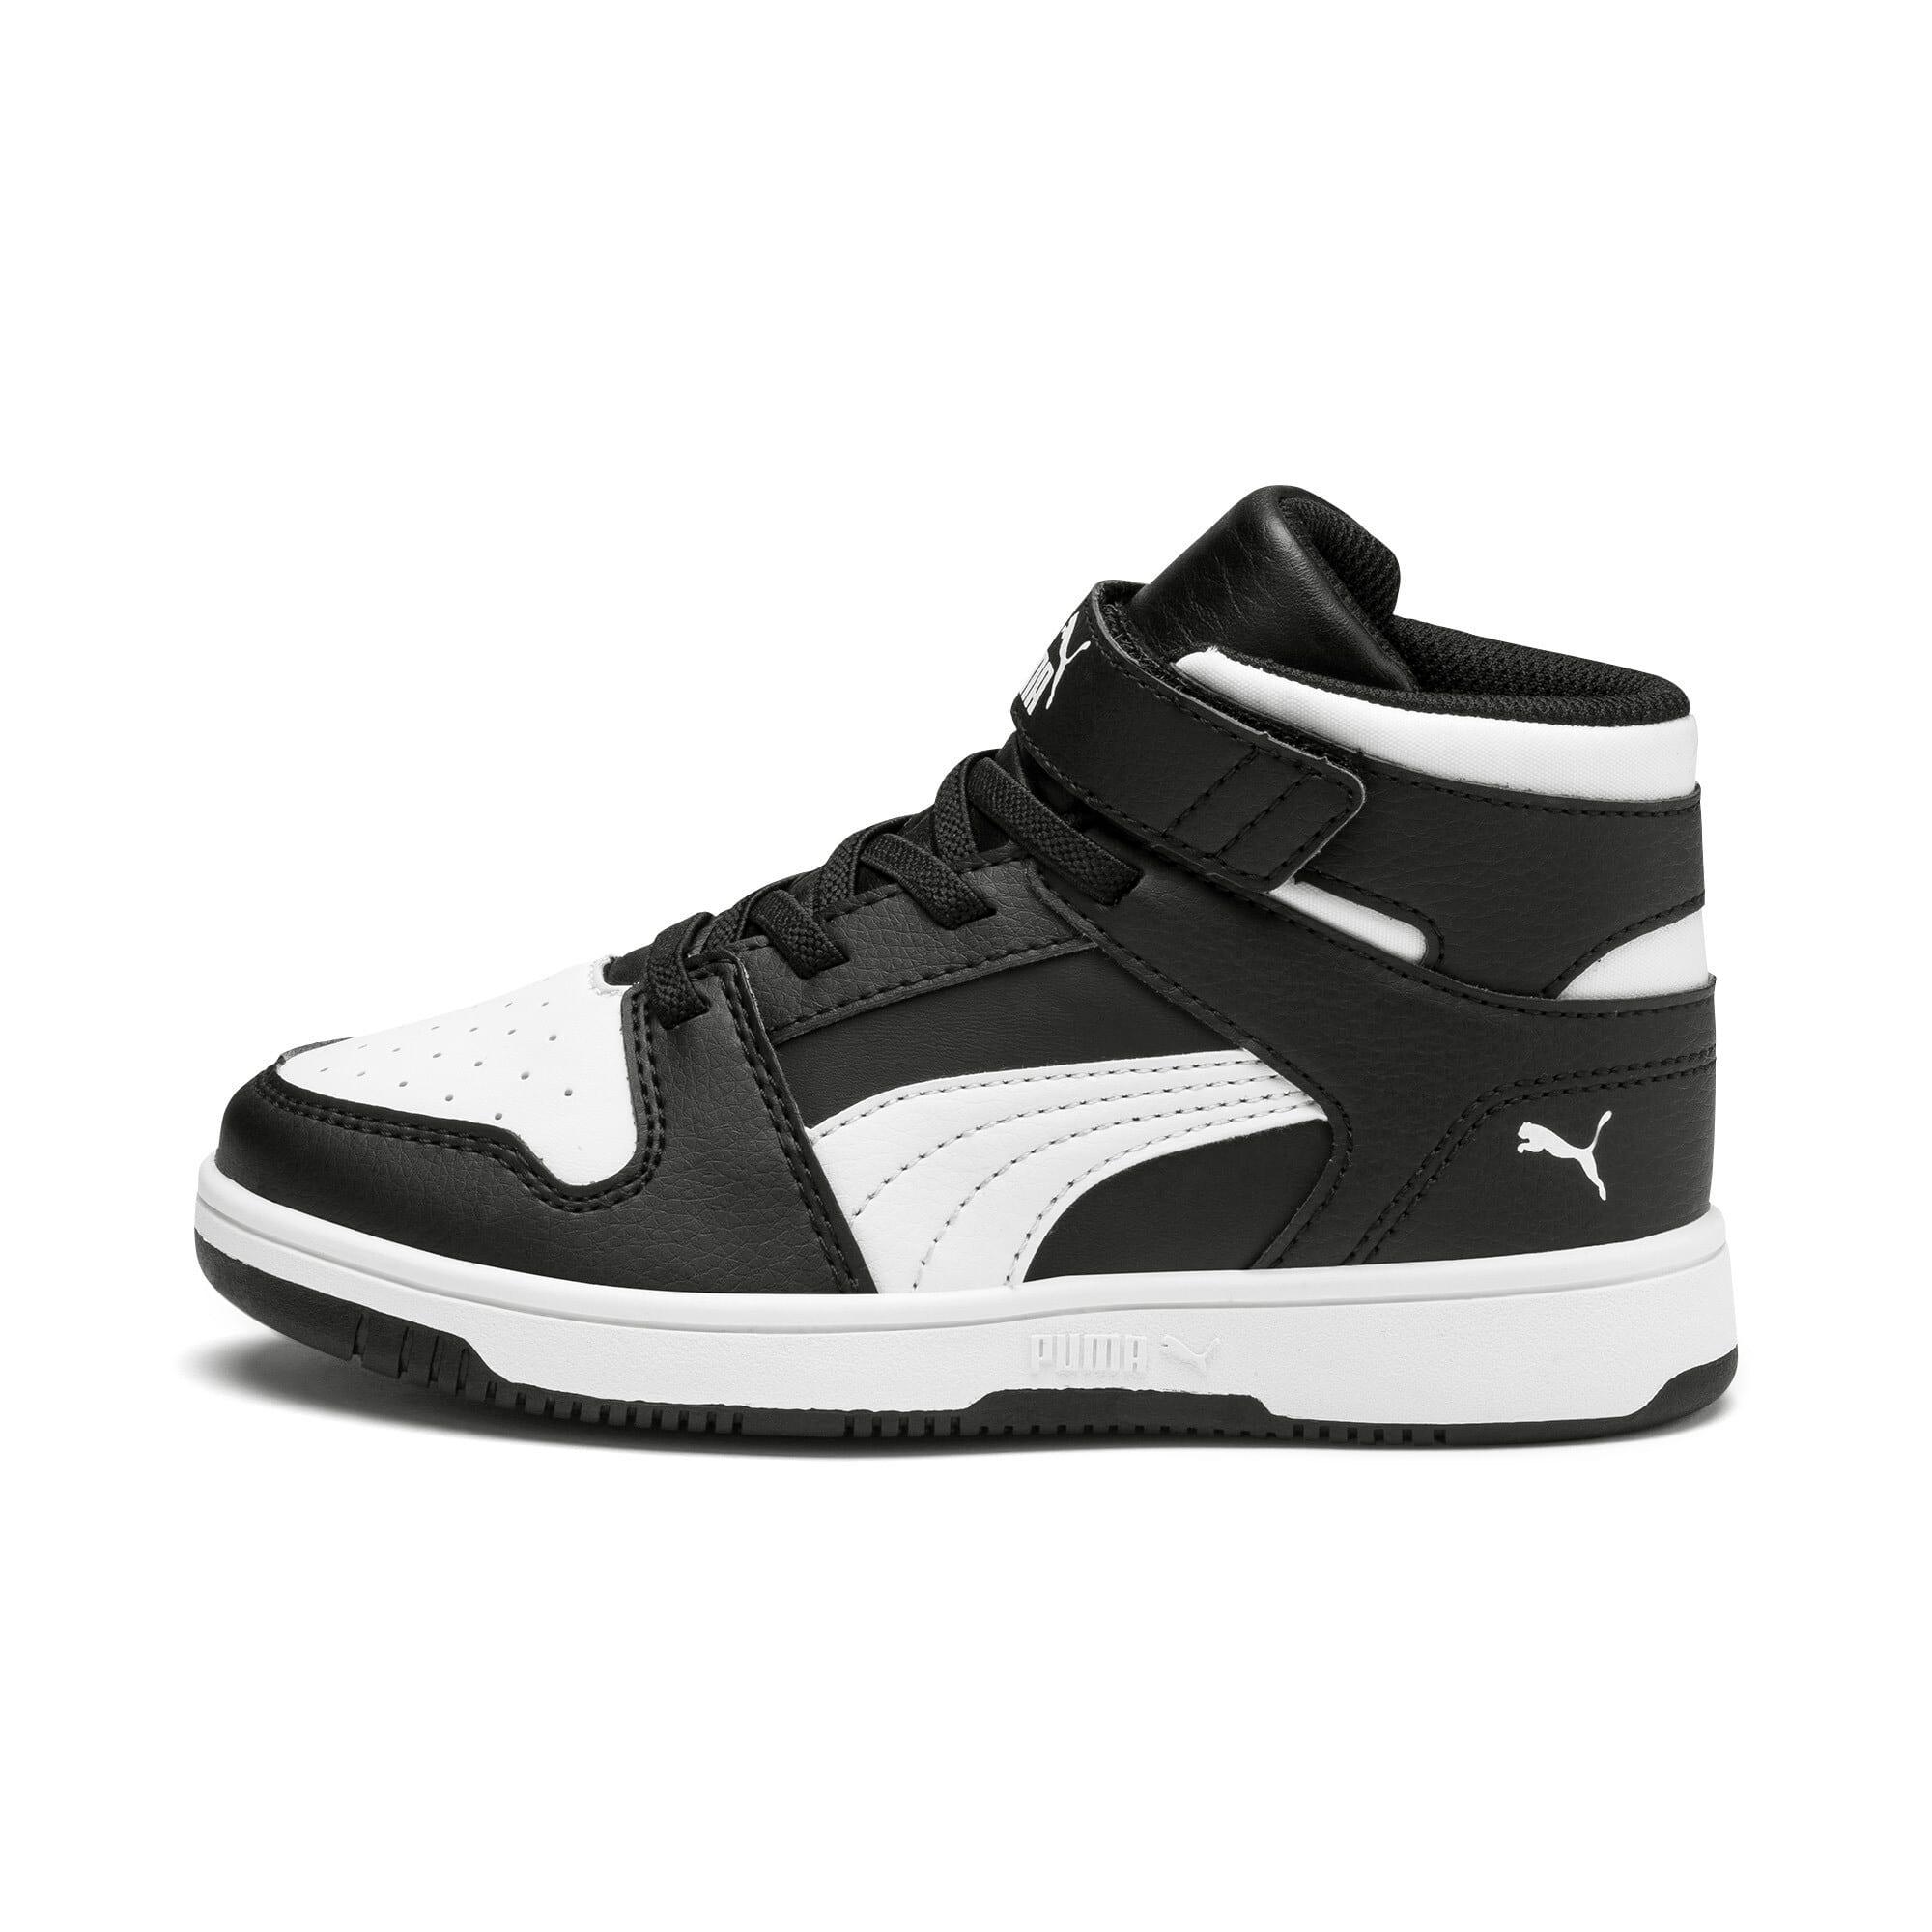 Thumbnail 1 of PUMA Rebound LayUp Little Kids' Shoes, Puma Black-Puma White, medium